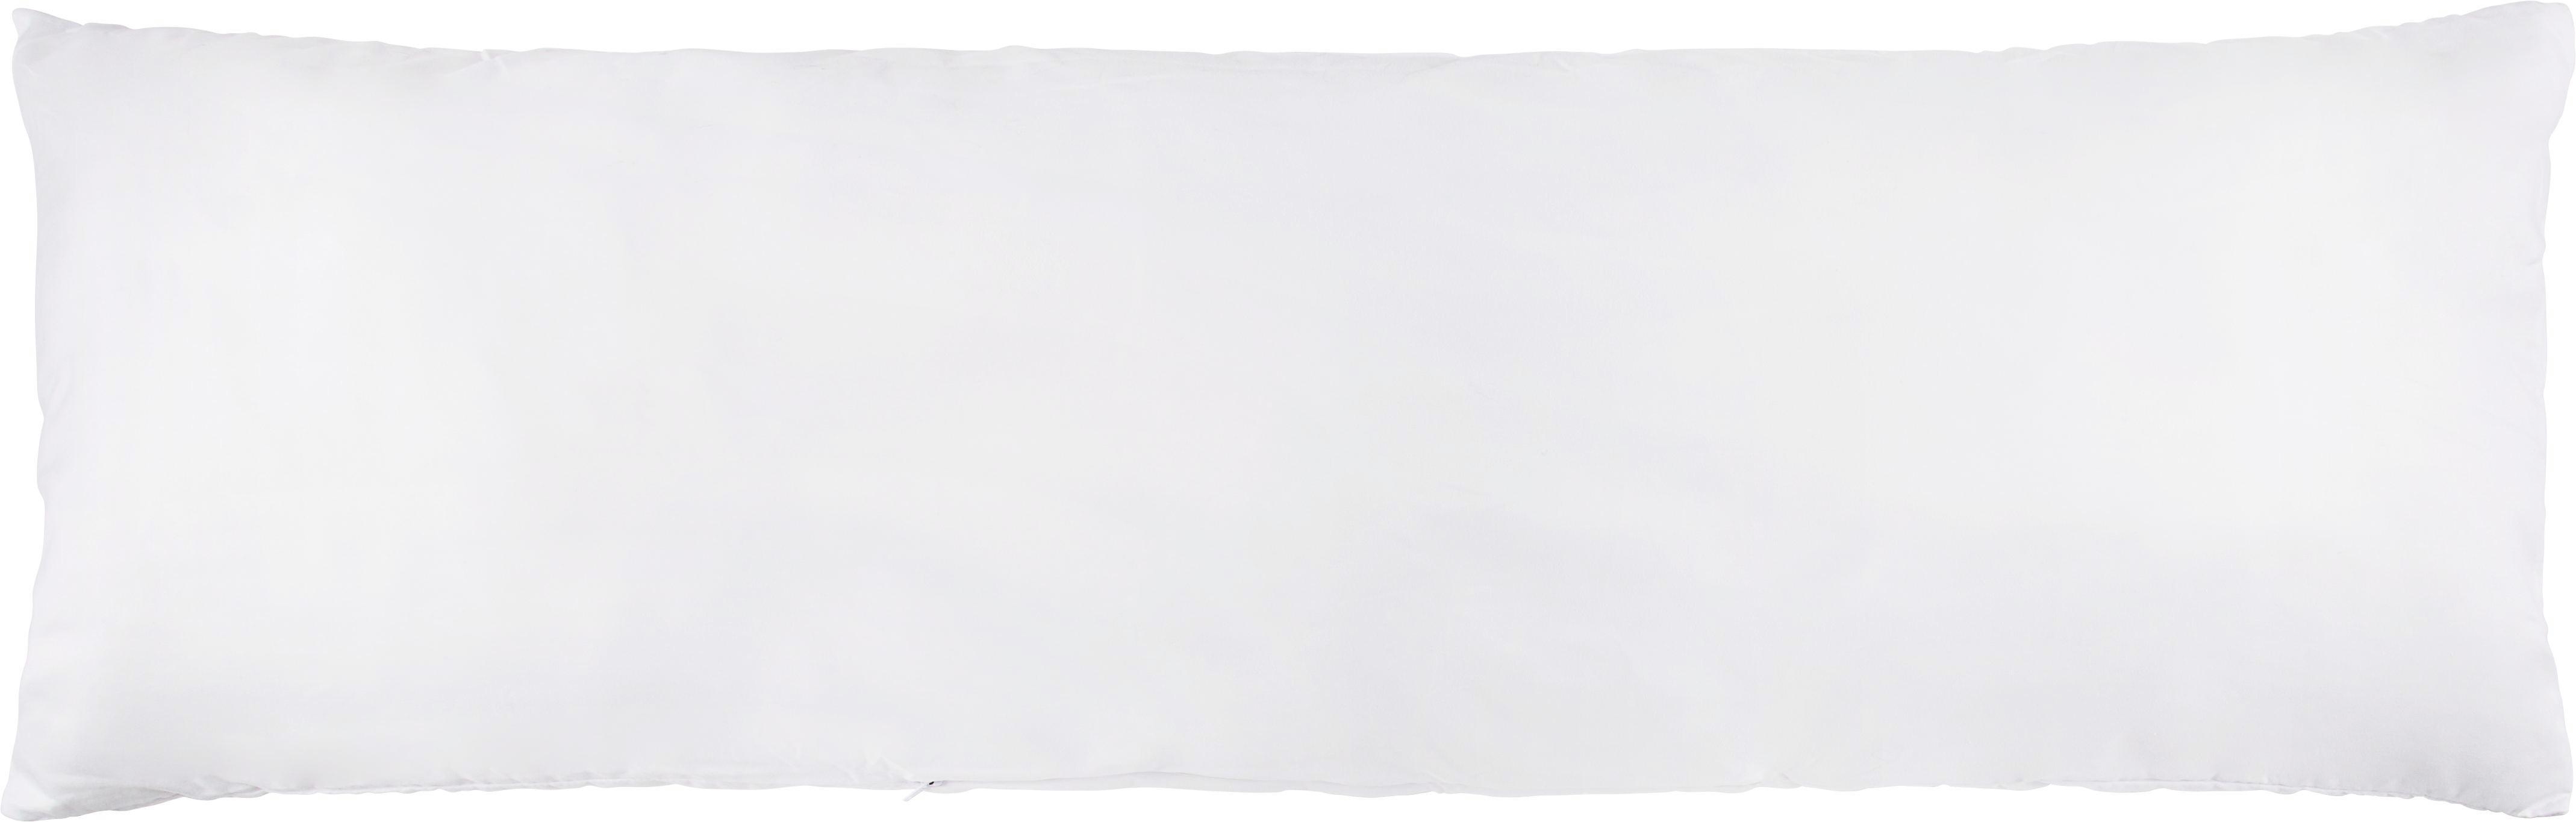 Kissenhülle Isi in Weiß , ca. 40x120cm - Weiß, Textil (40/120cm) - MÖMAX modern living